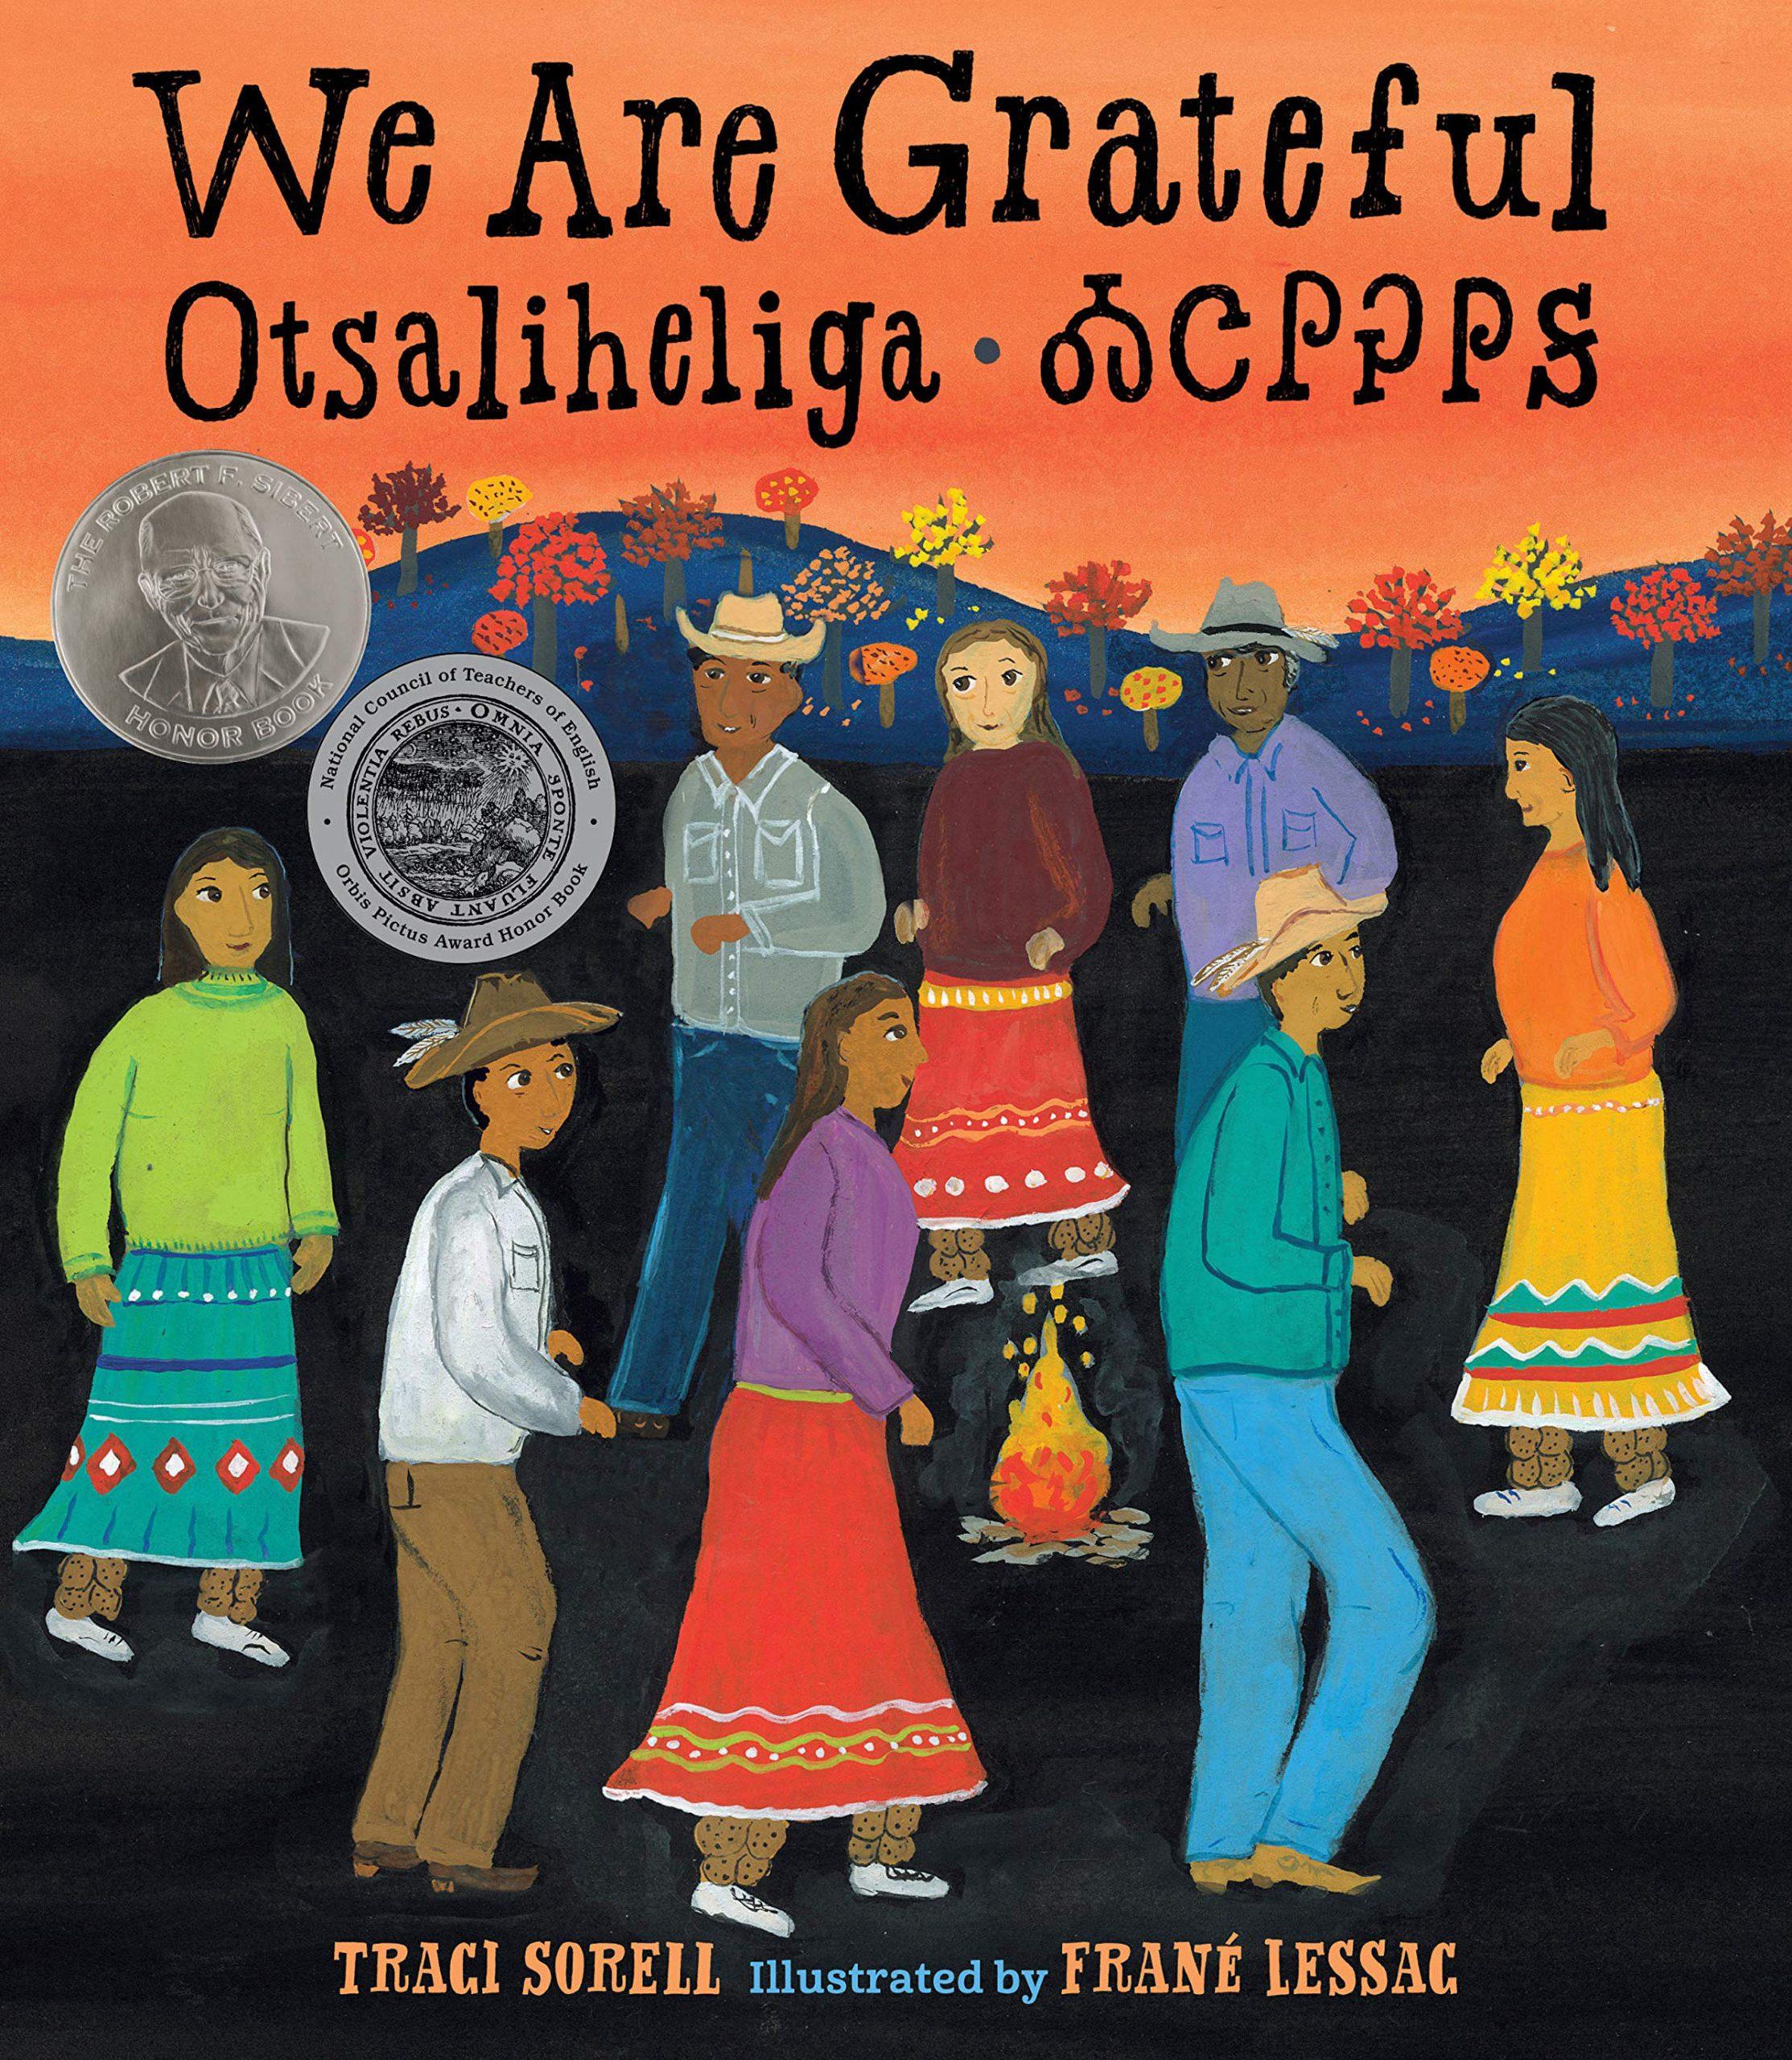 WE ARE GRATEFUL/OTSALIHELIGA TRACI SORELL AND FRANE LESSAC